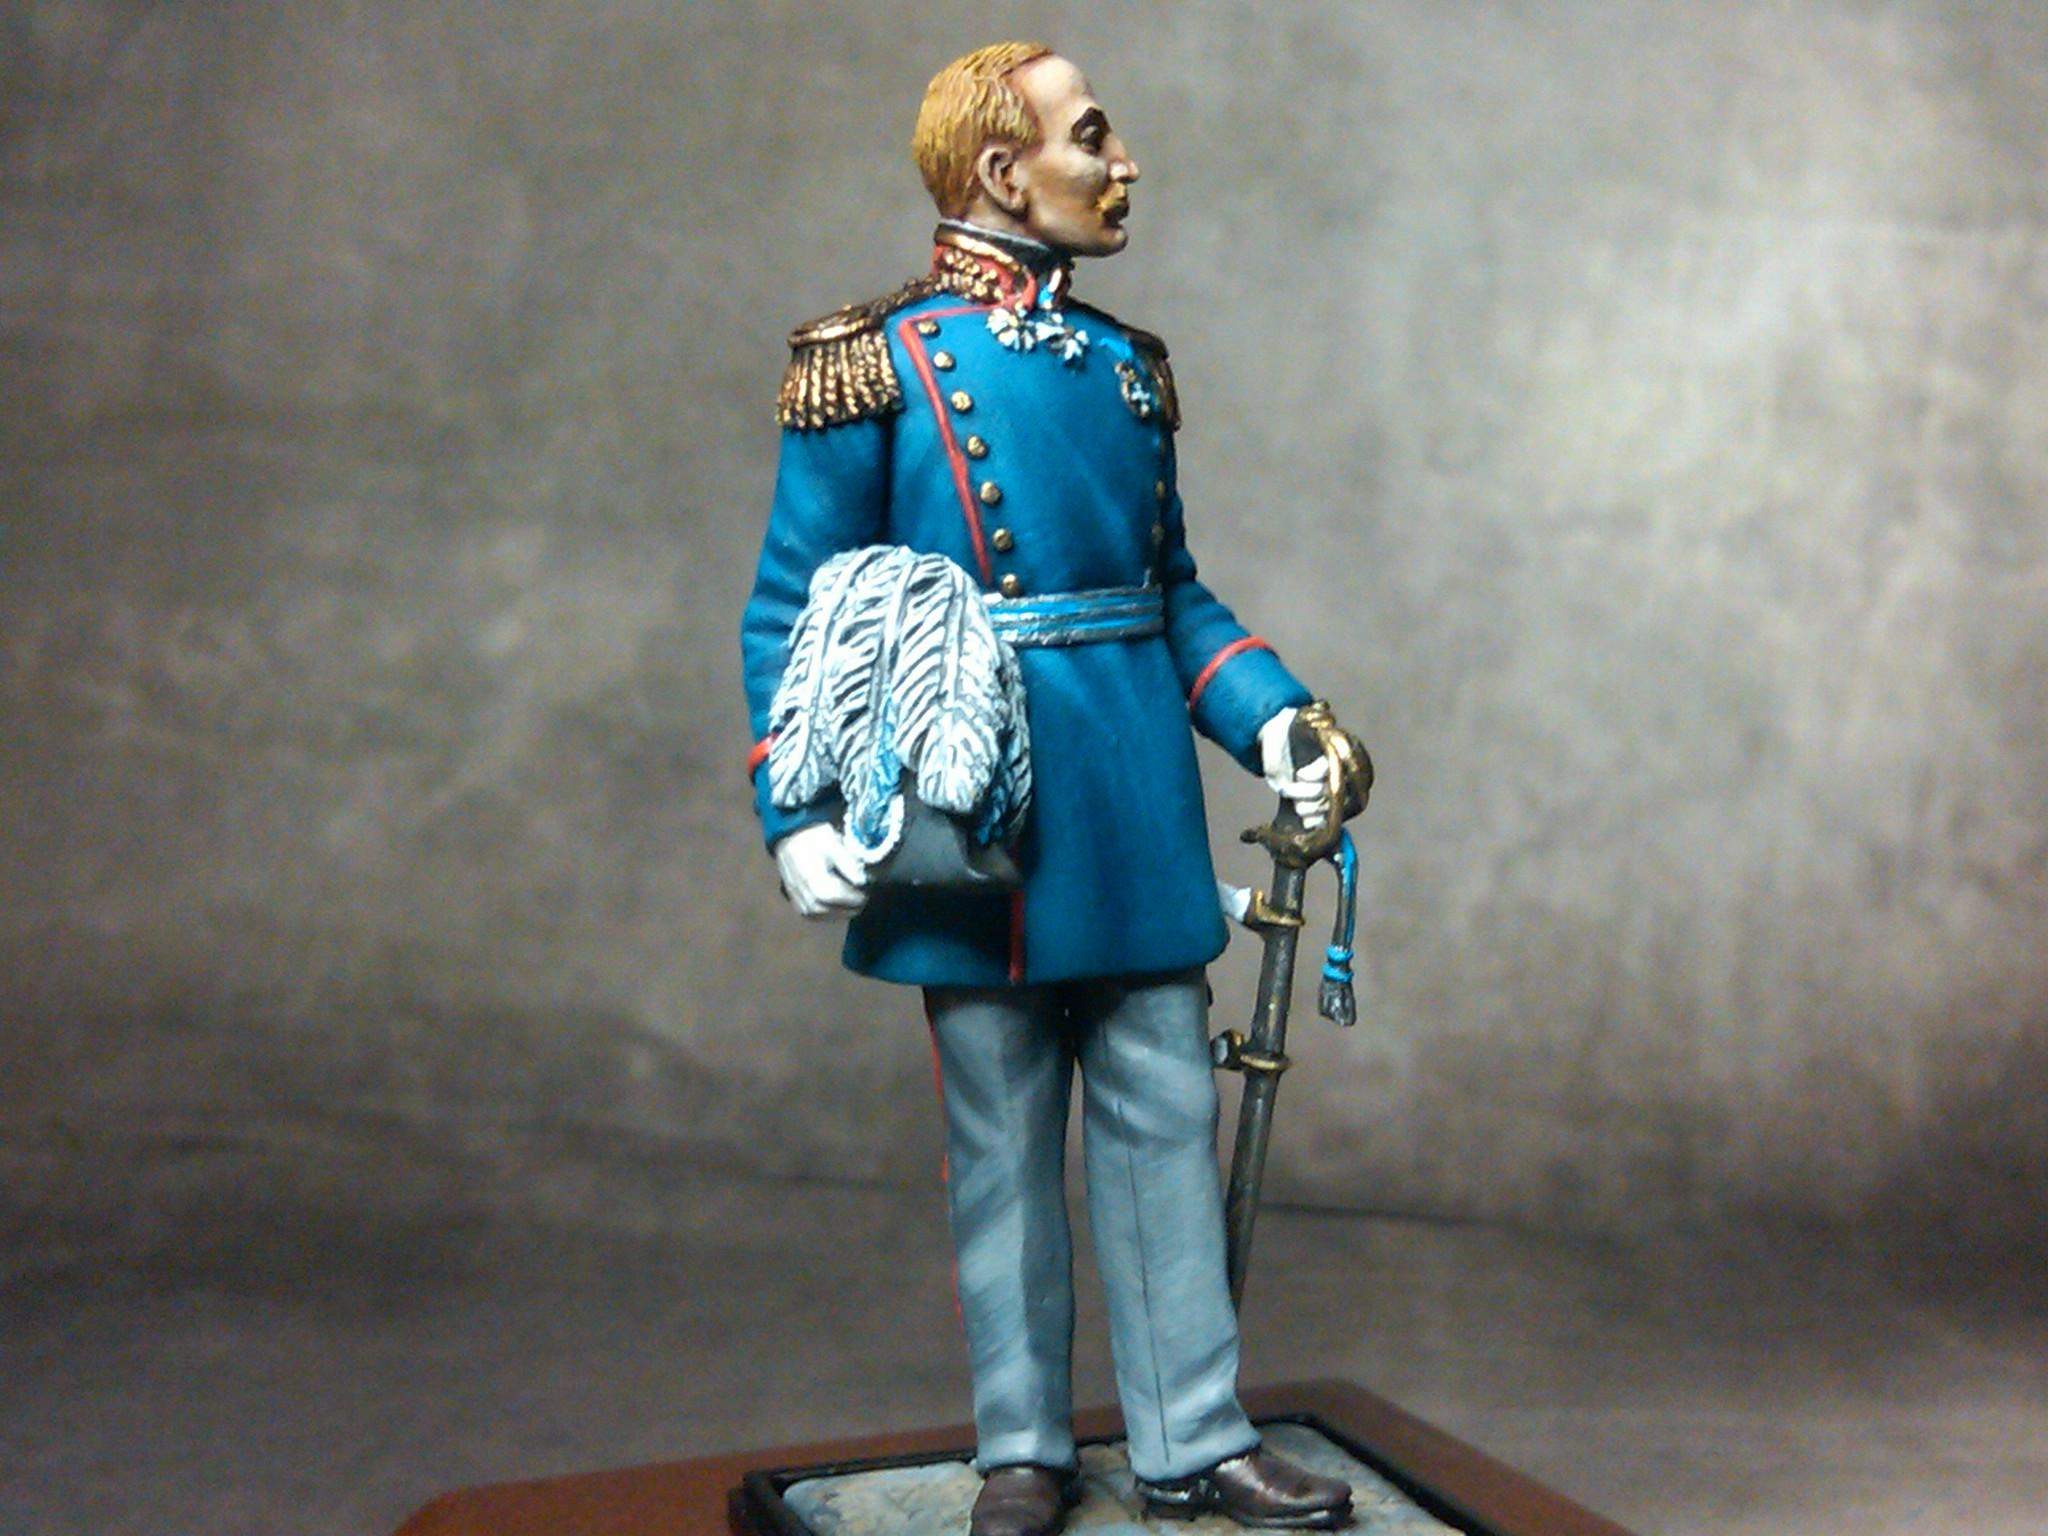 Kostas BOTSARIS, Greek army,Greekheroes,miniatures,Κωστας ΜΠΟΤΣΑΡΗΣ, μινιατουρες.